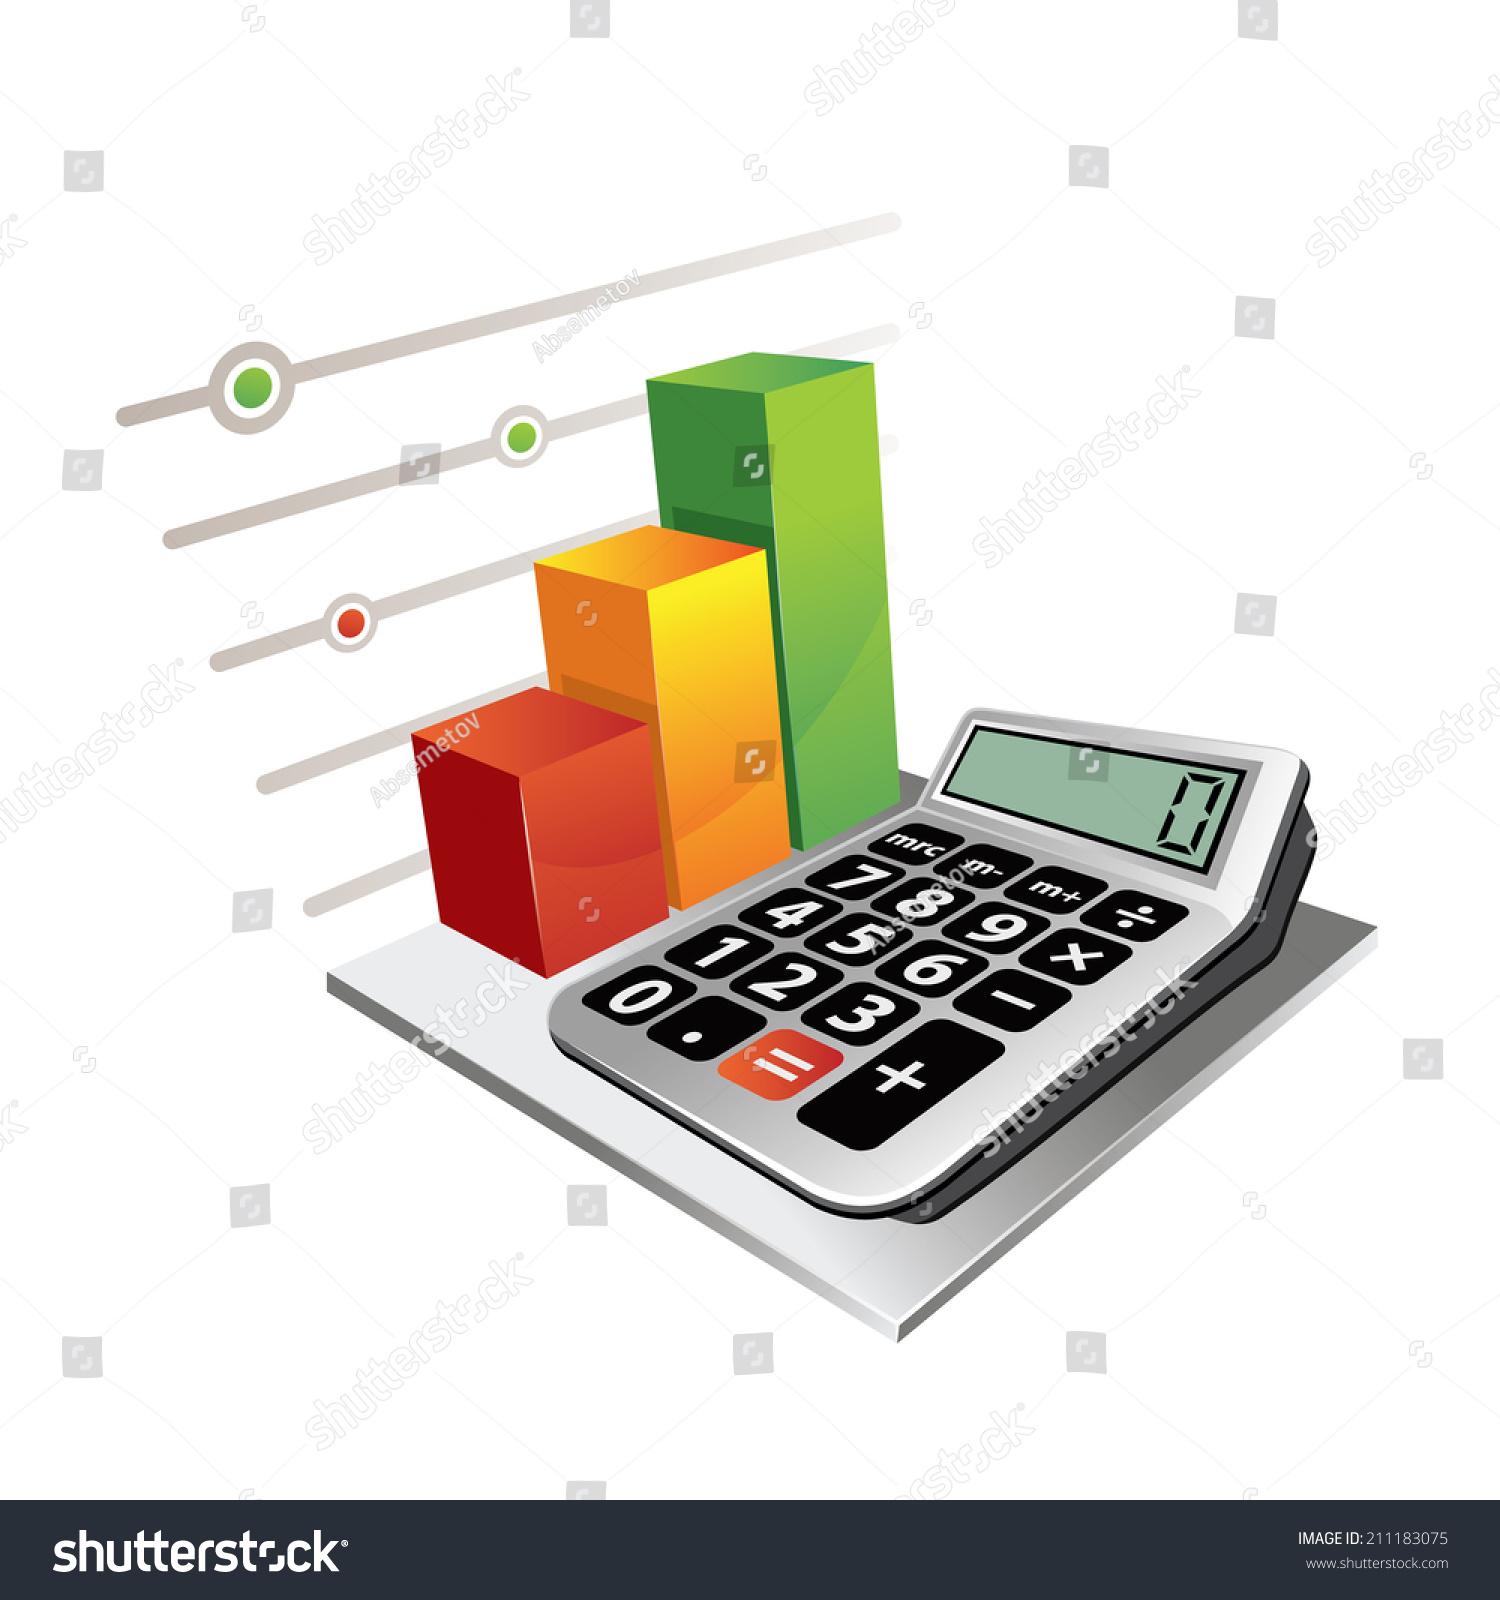 Calculator colorful bar graph stock vector 2018 211183075 calculator colorful bar graph ccuart Gallery